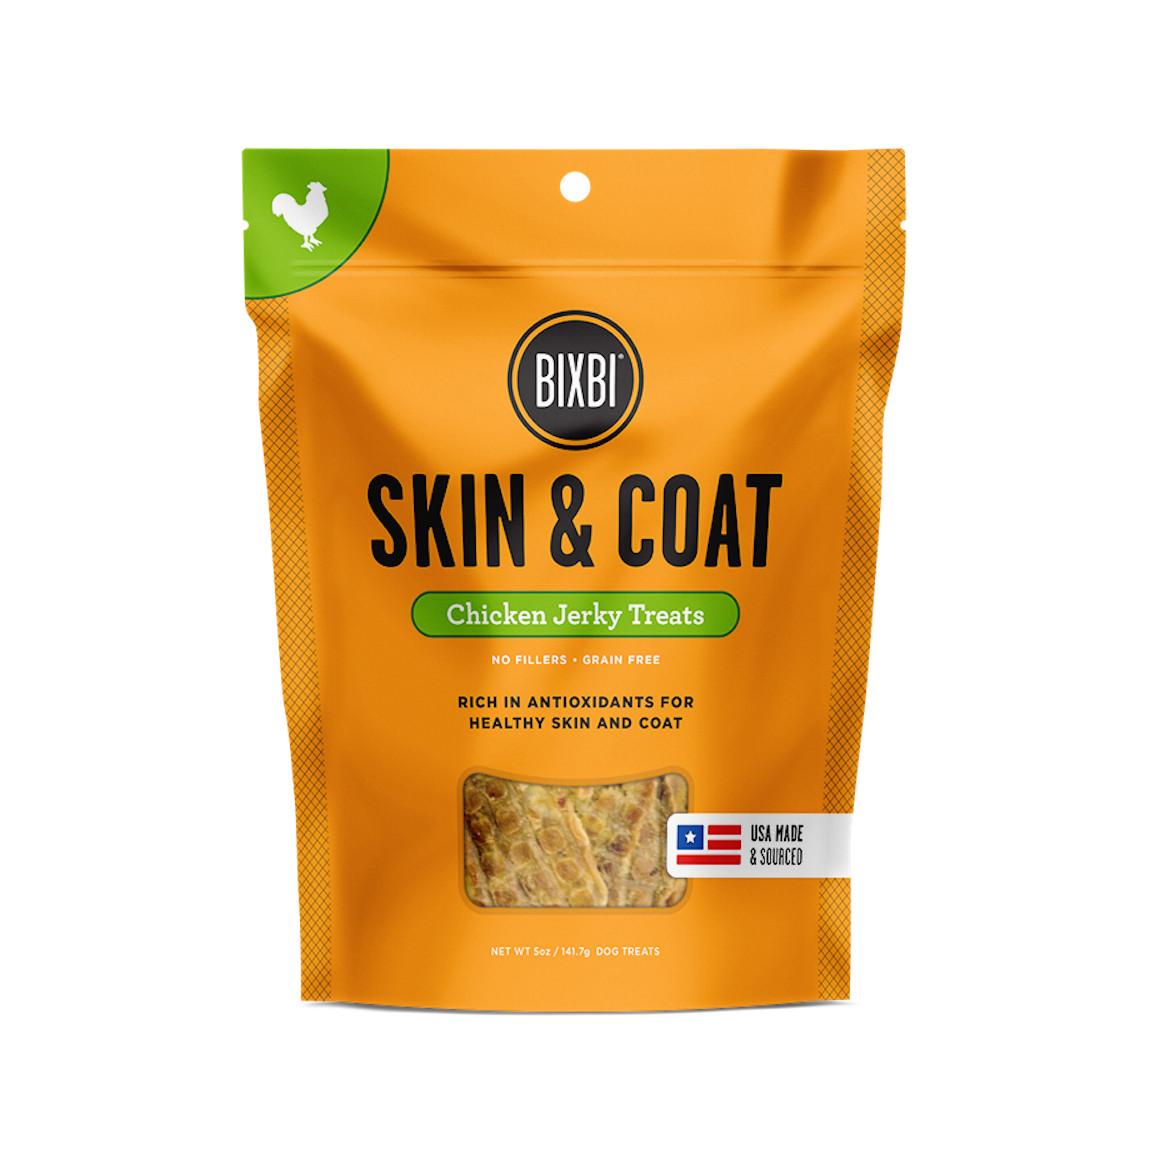 click here to shop Bixbi Skin & Coat Chicken Jerky Dog Treats